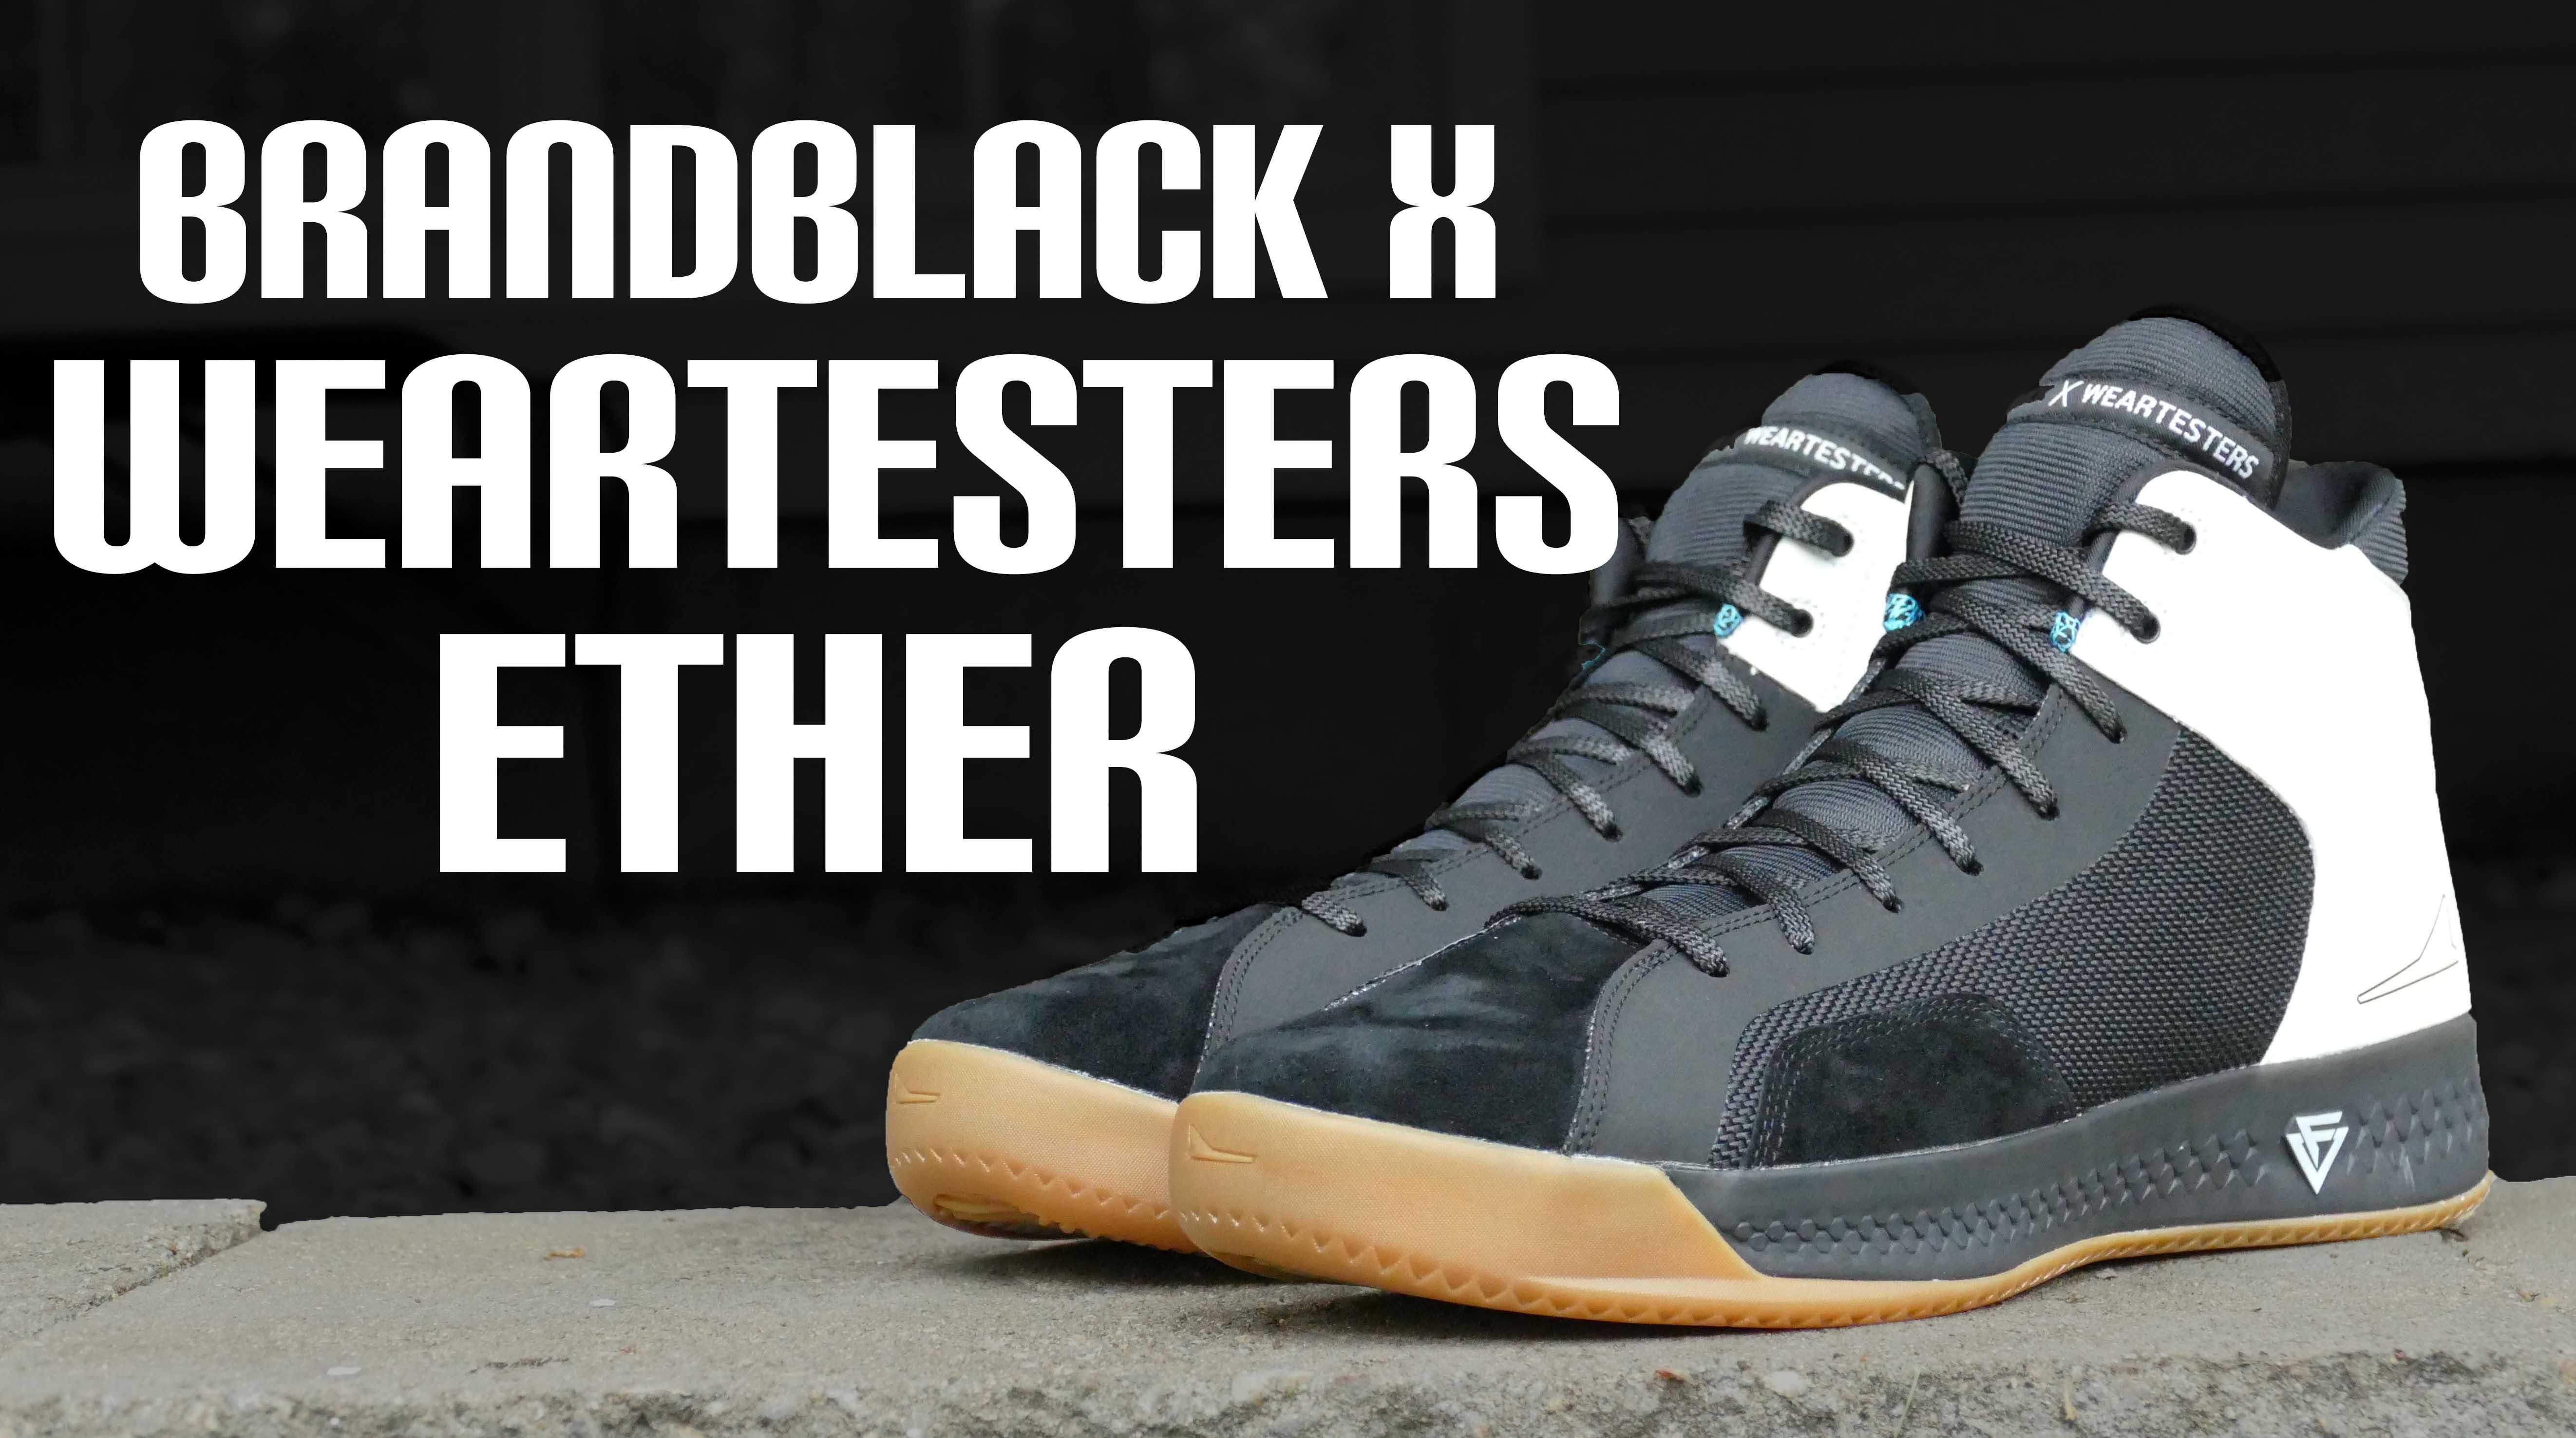 e475de82a165 WearTesters - Page 355 of 948 - Sneaker Performance Reviews ...